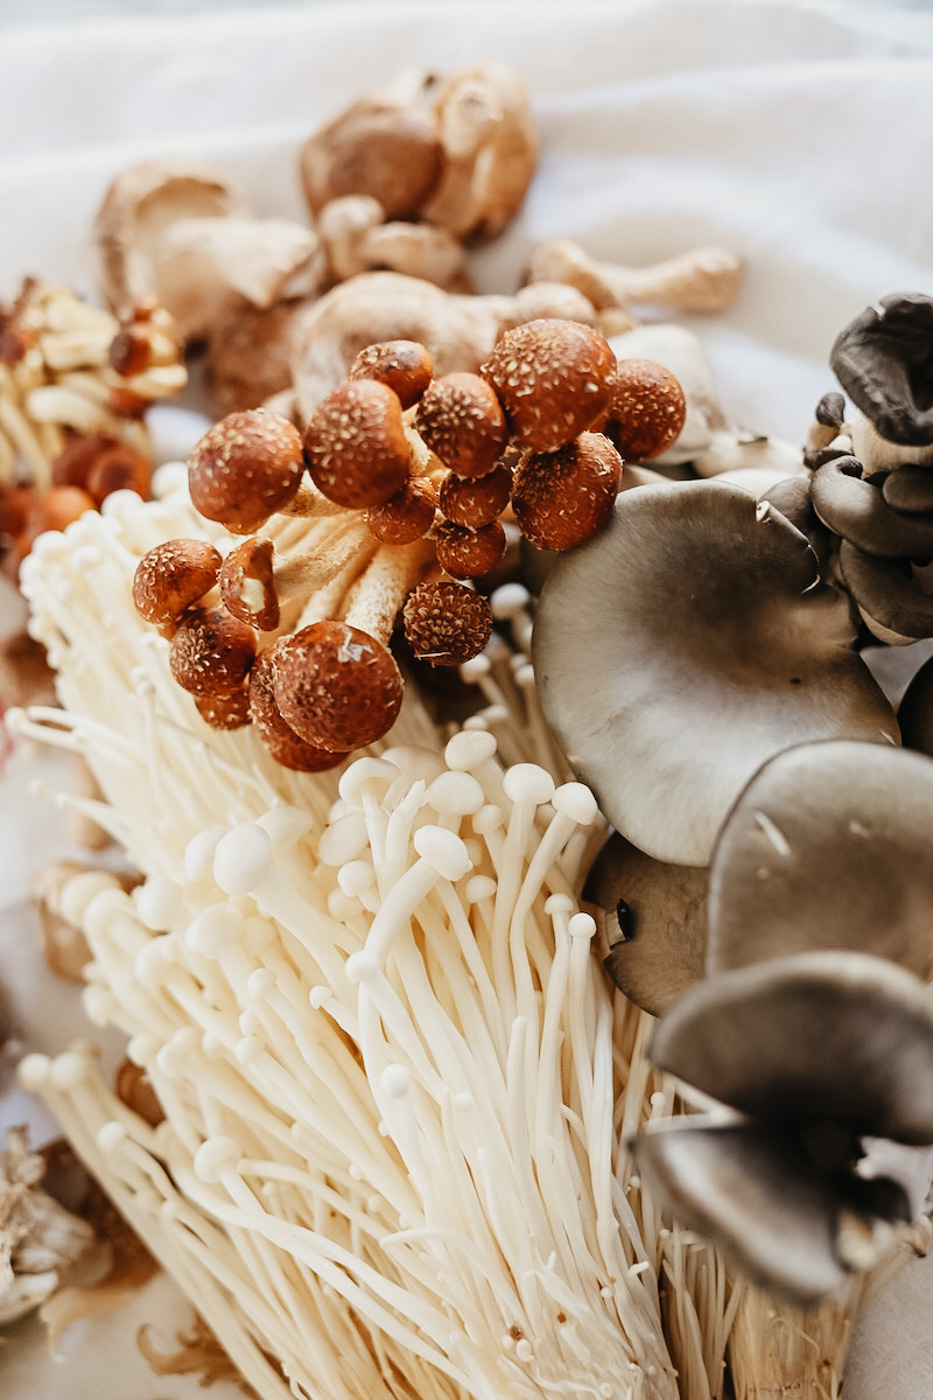 The Mushroom course - Ethics, Cautions, and Techniques of Mushroom Foraging; Common Wild Mushrooms; Mushroom Cultivation